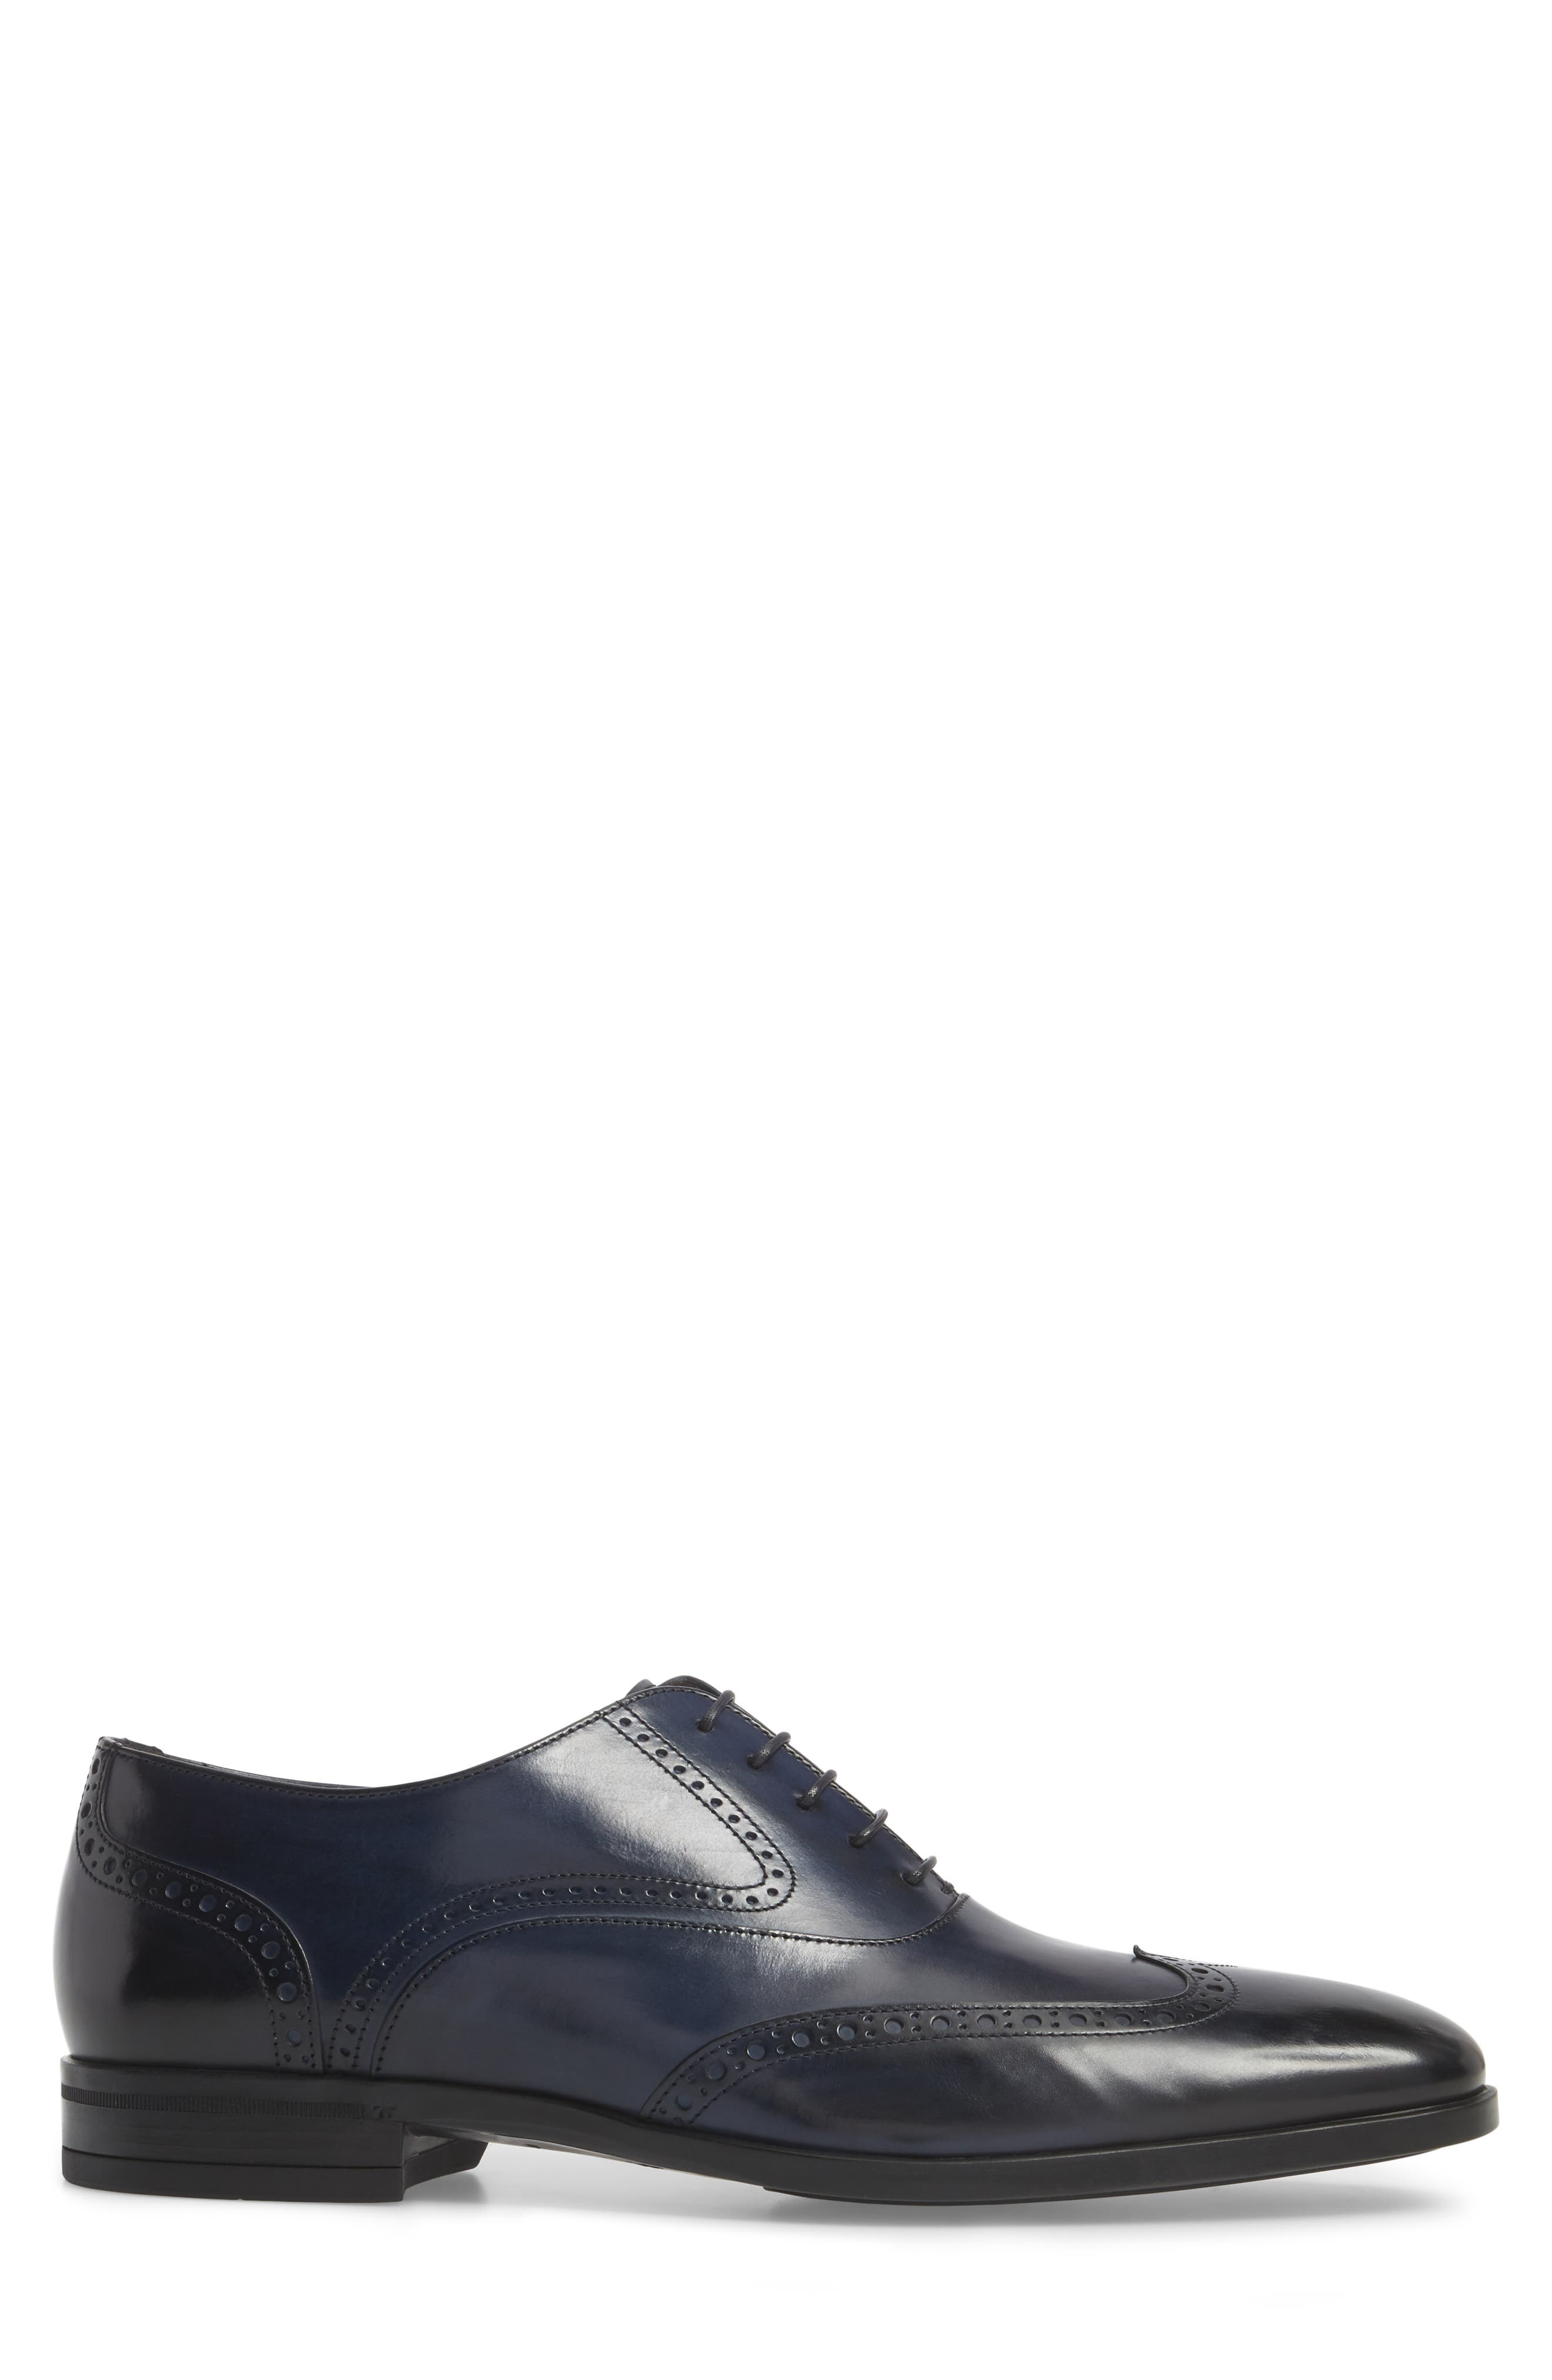 Portland Wingtip,                             Alternate thumbnail 3, color,                             Dark Blue Leather